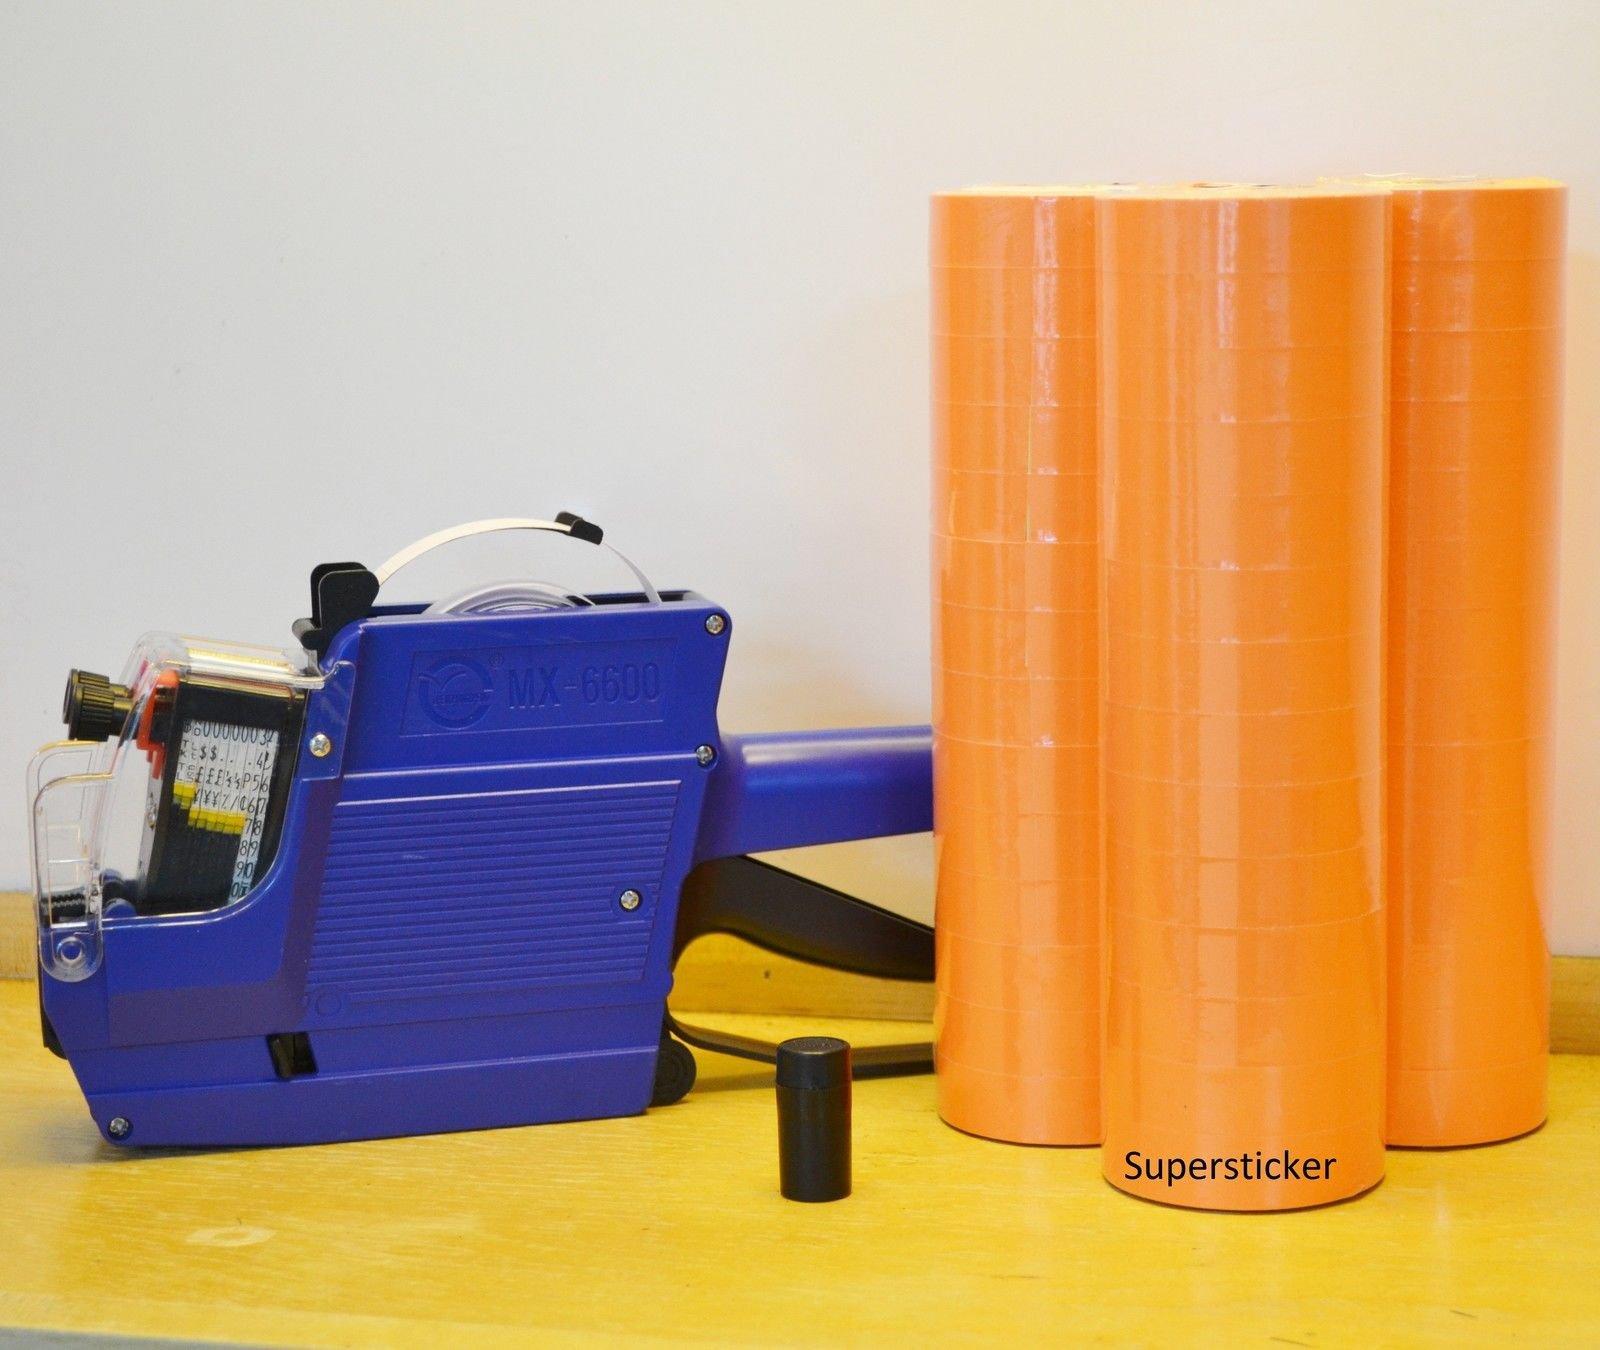 Mx-6600 10 Digits 2 Lines Price Tag Gun labeler +1 Ink + 42 Rolls Orange 500 Tag